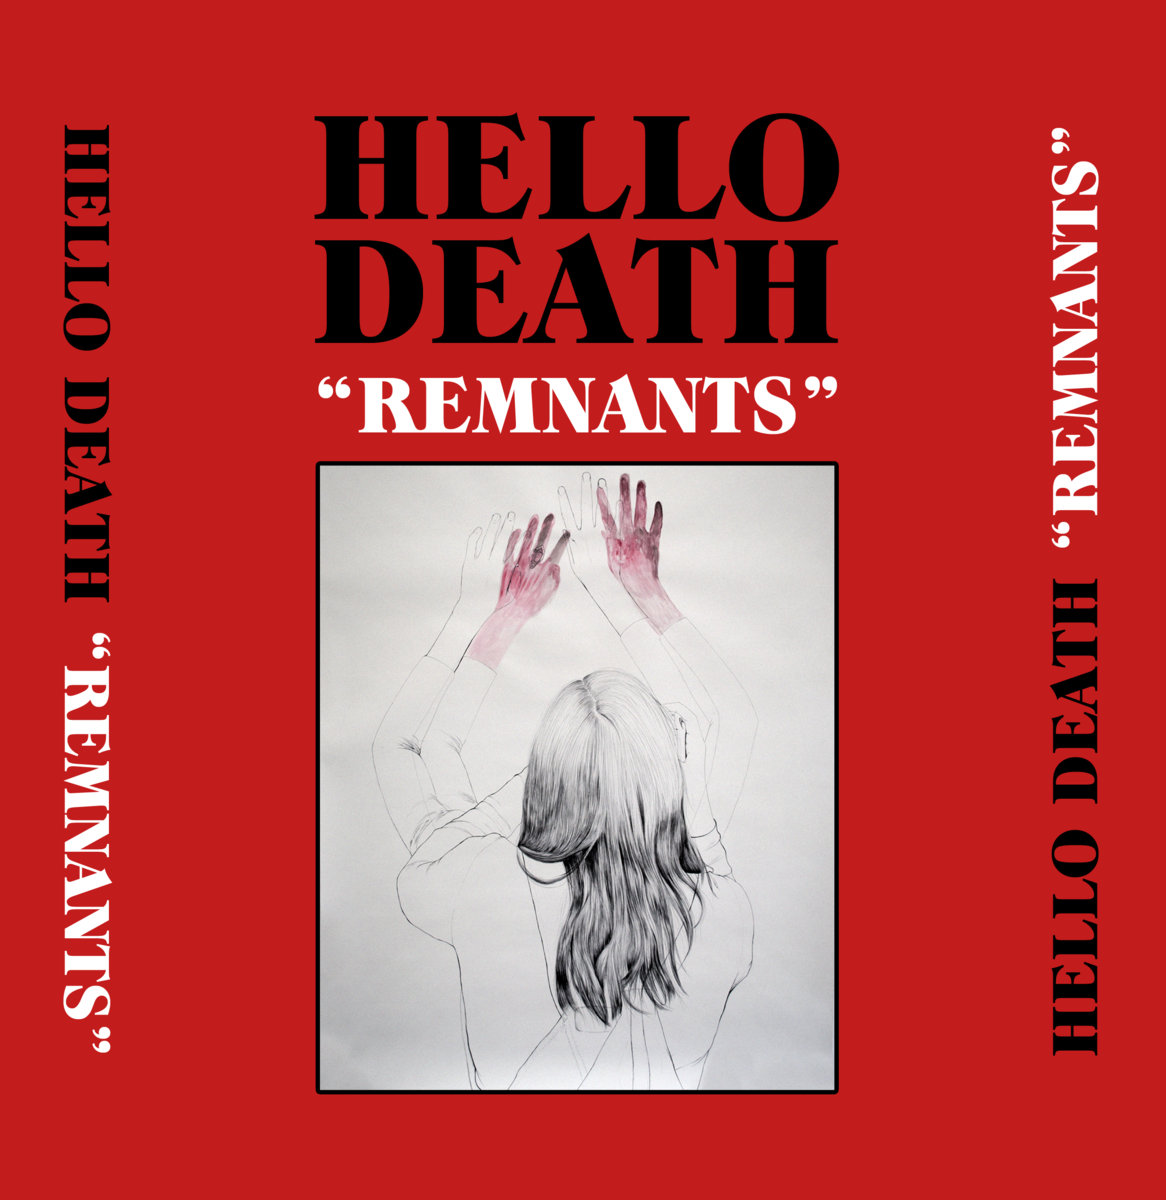 GLS005 - Hello Death - Remnants